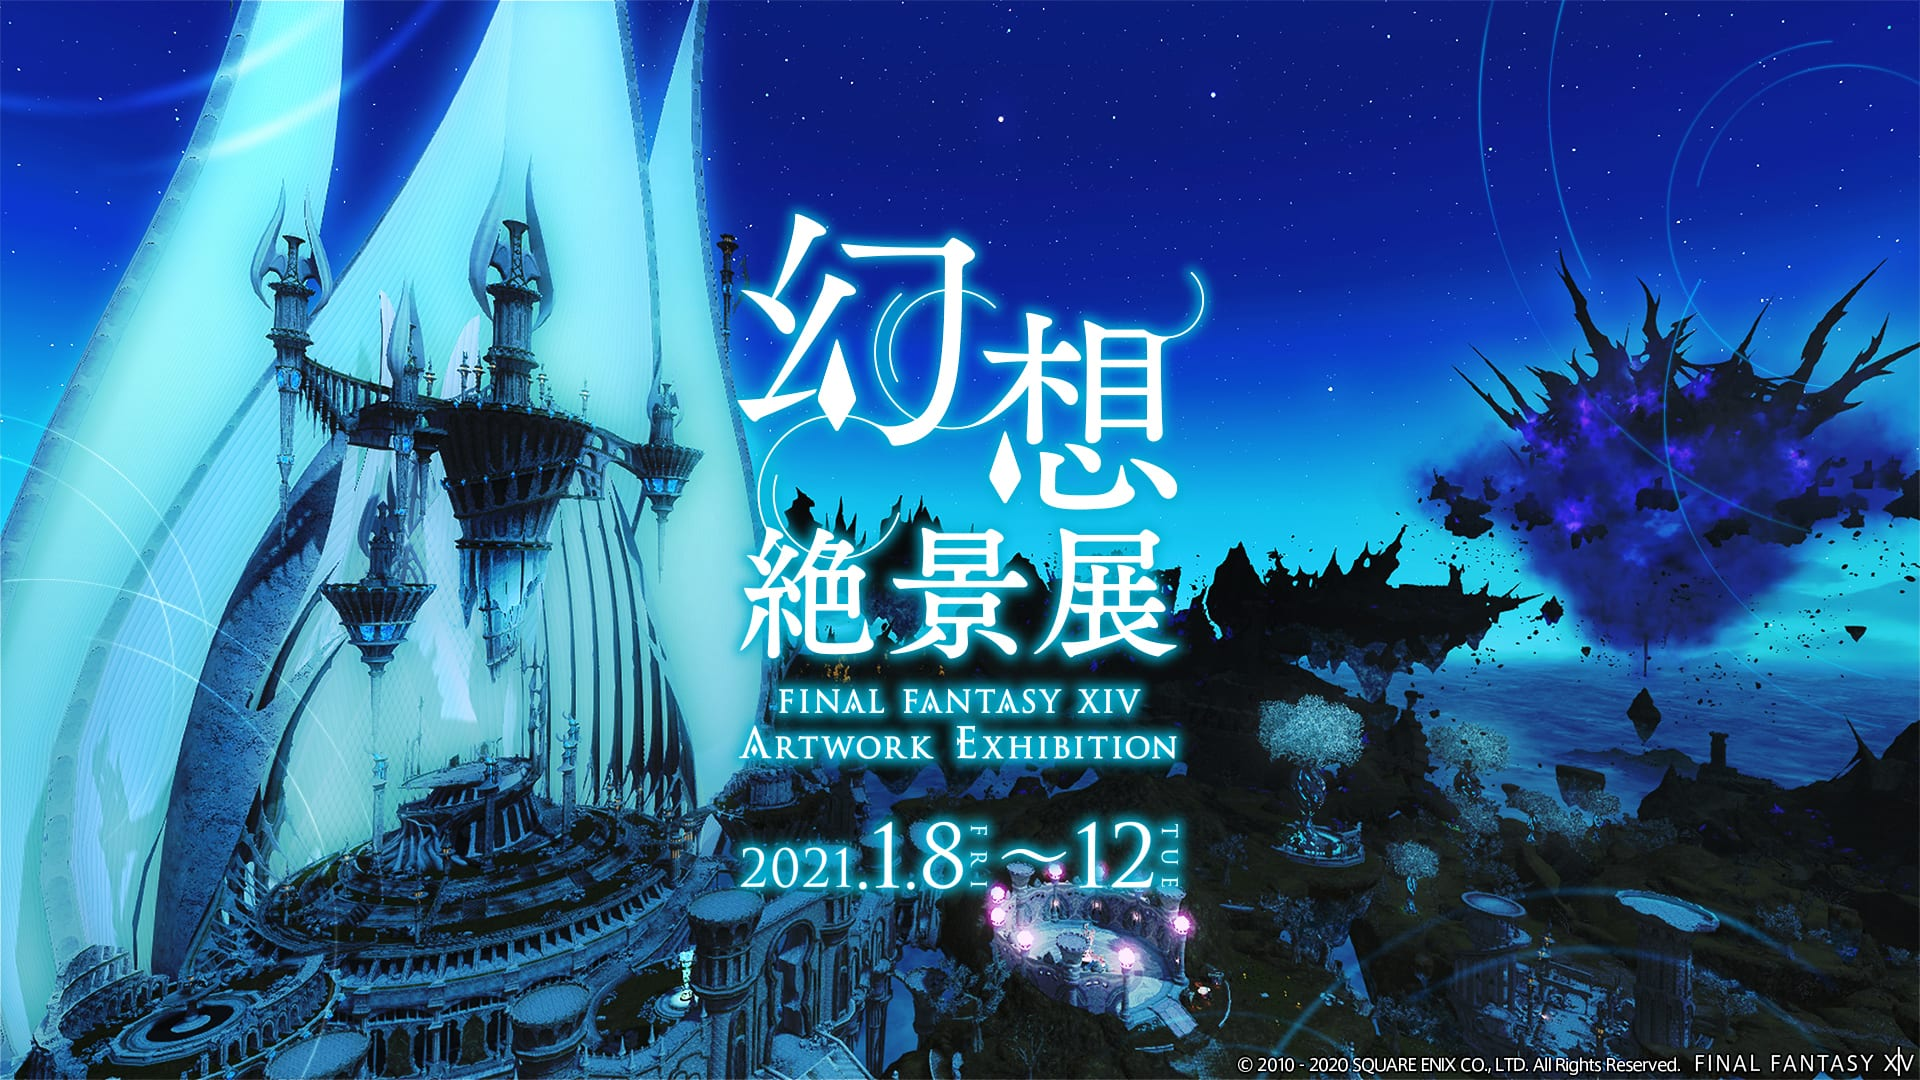 Final Fantasy XIV Artwork Exhibition